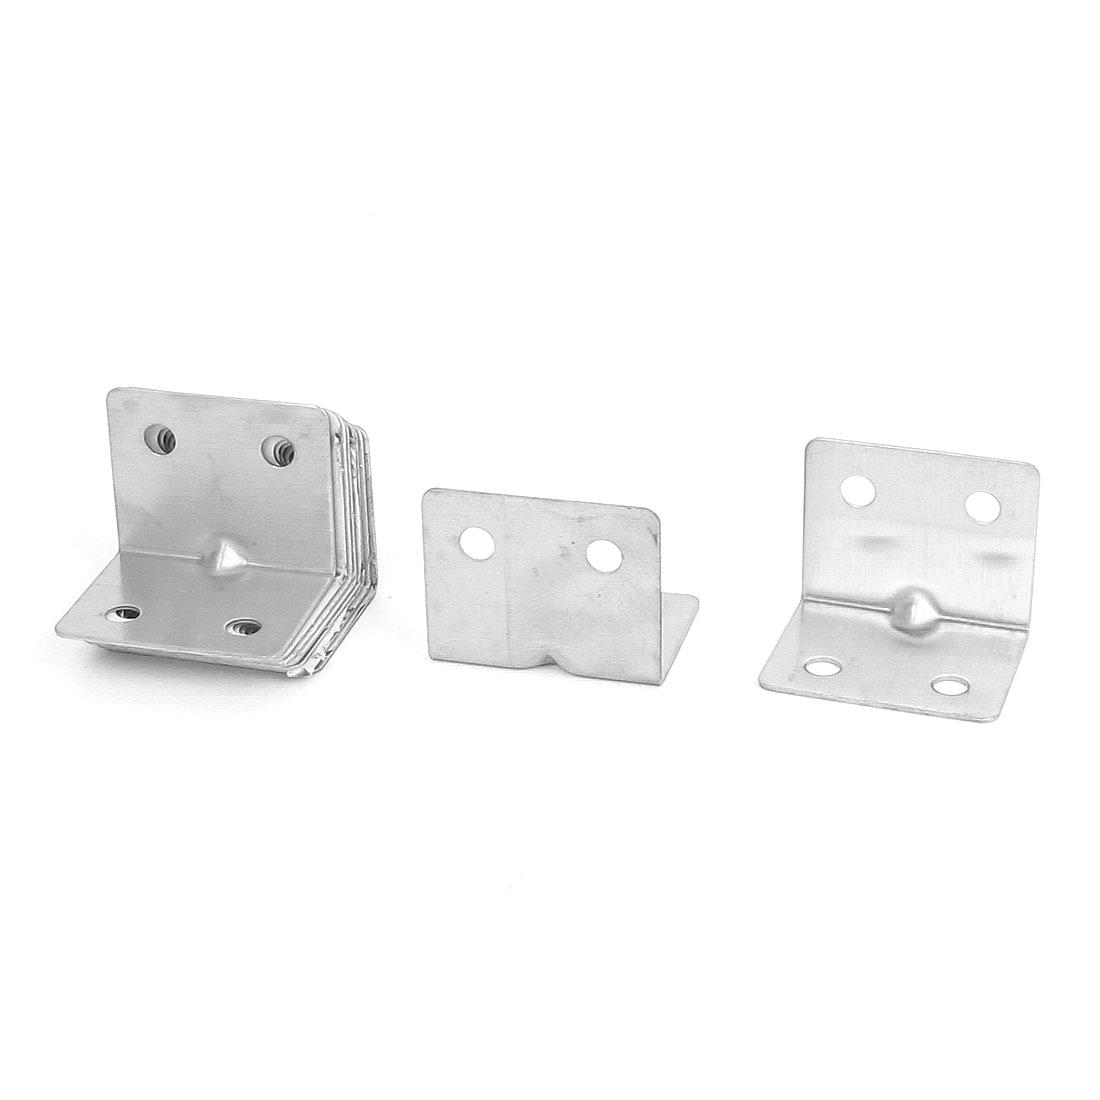 28mmx28mmx35mm L Shape Corner Brace Repair Right Angle Bracket Shelf Support 10pcs